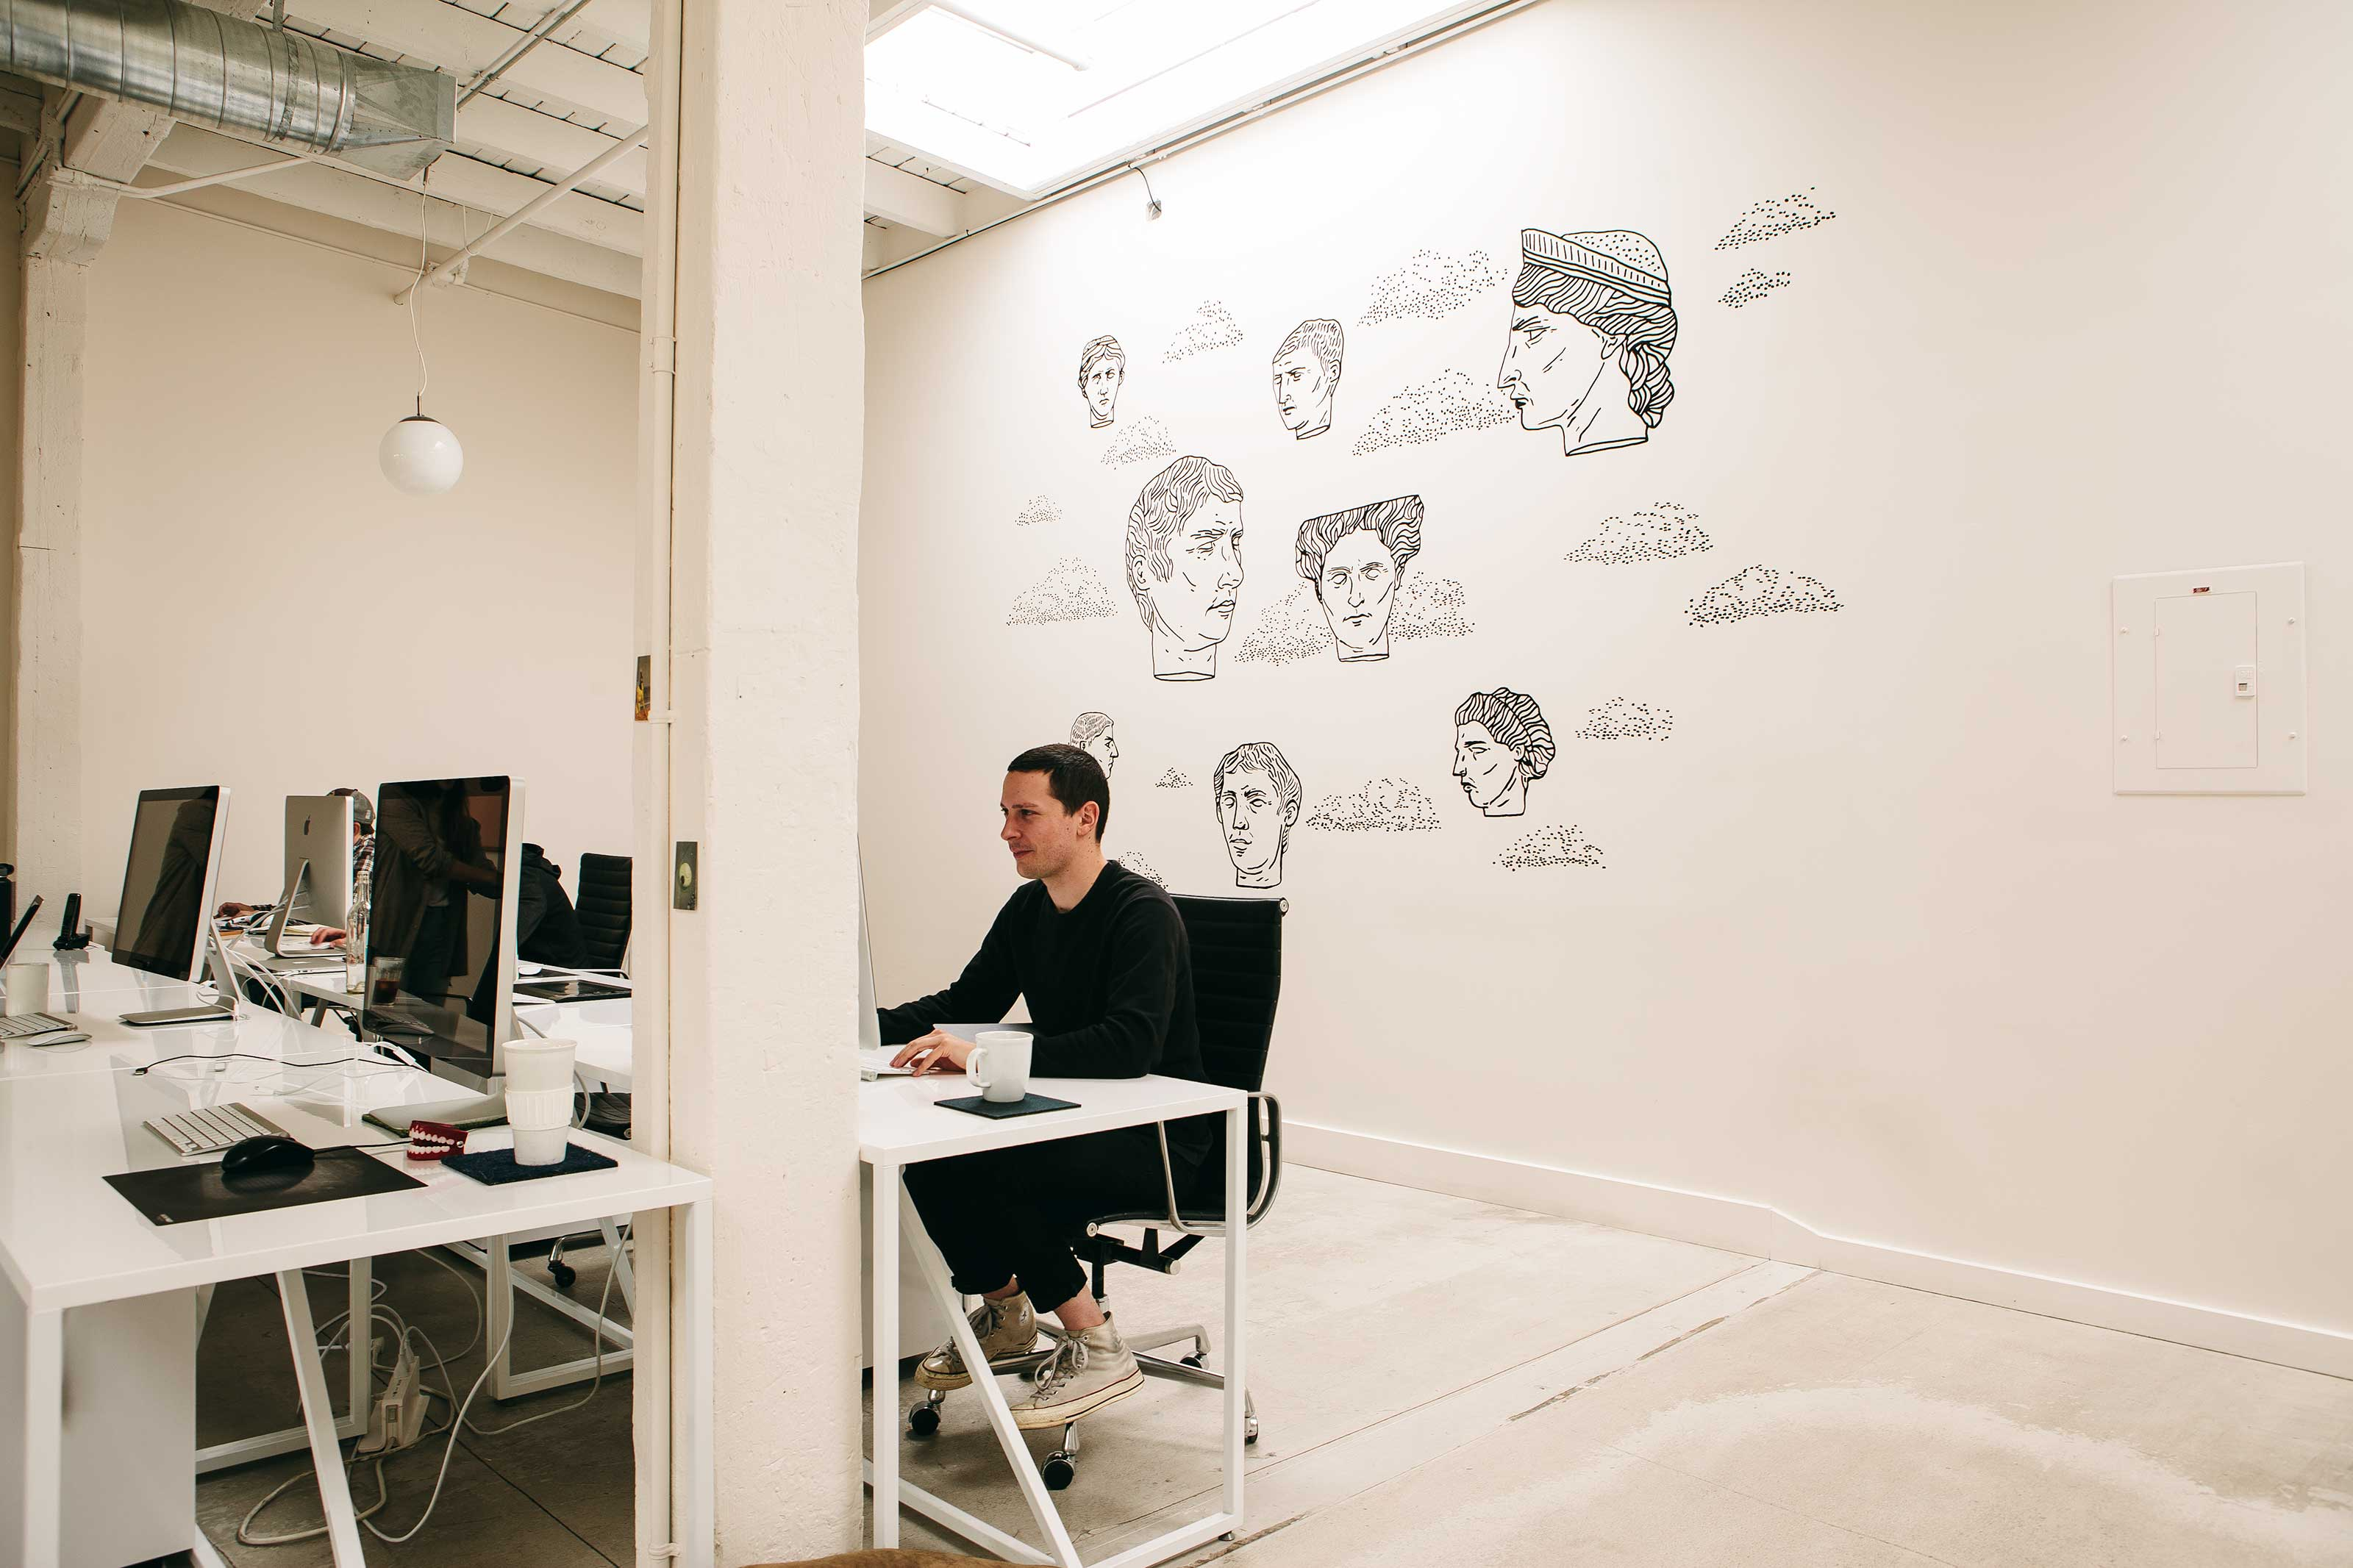 Interior Designer Job how to land a design job at fuzzco - tobias van schneider - design